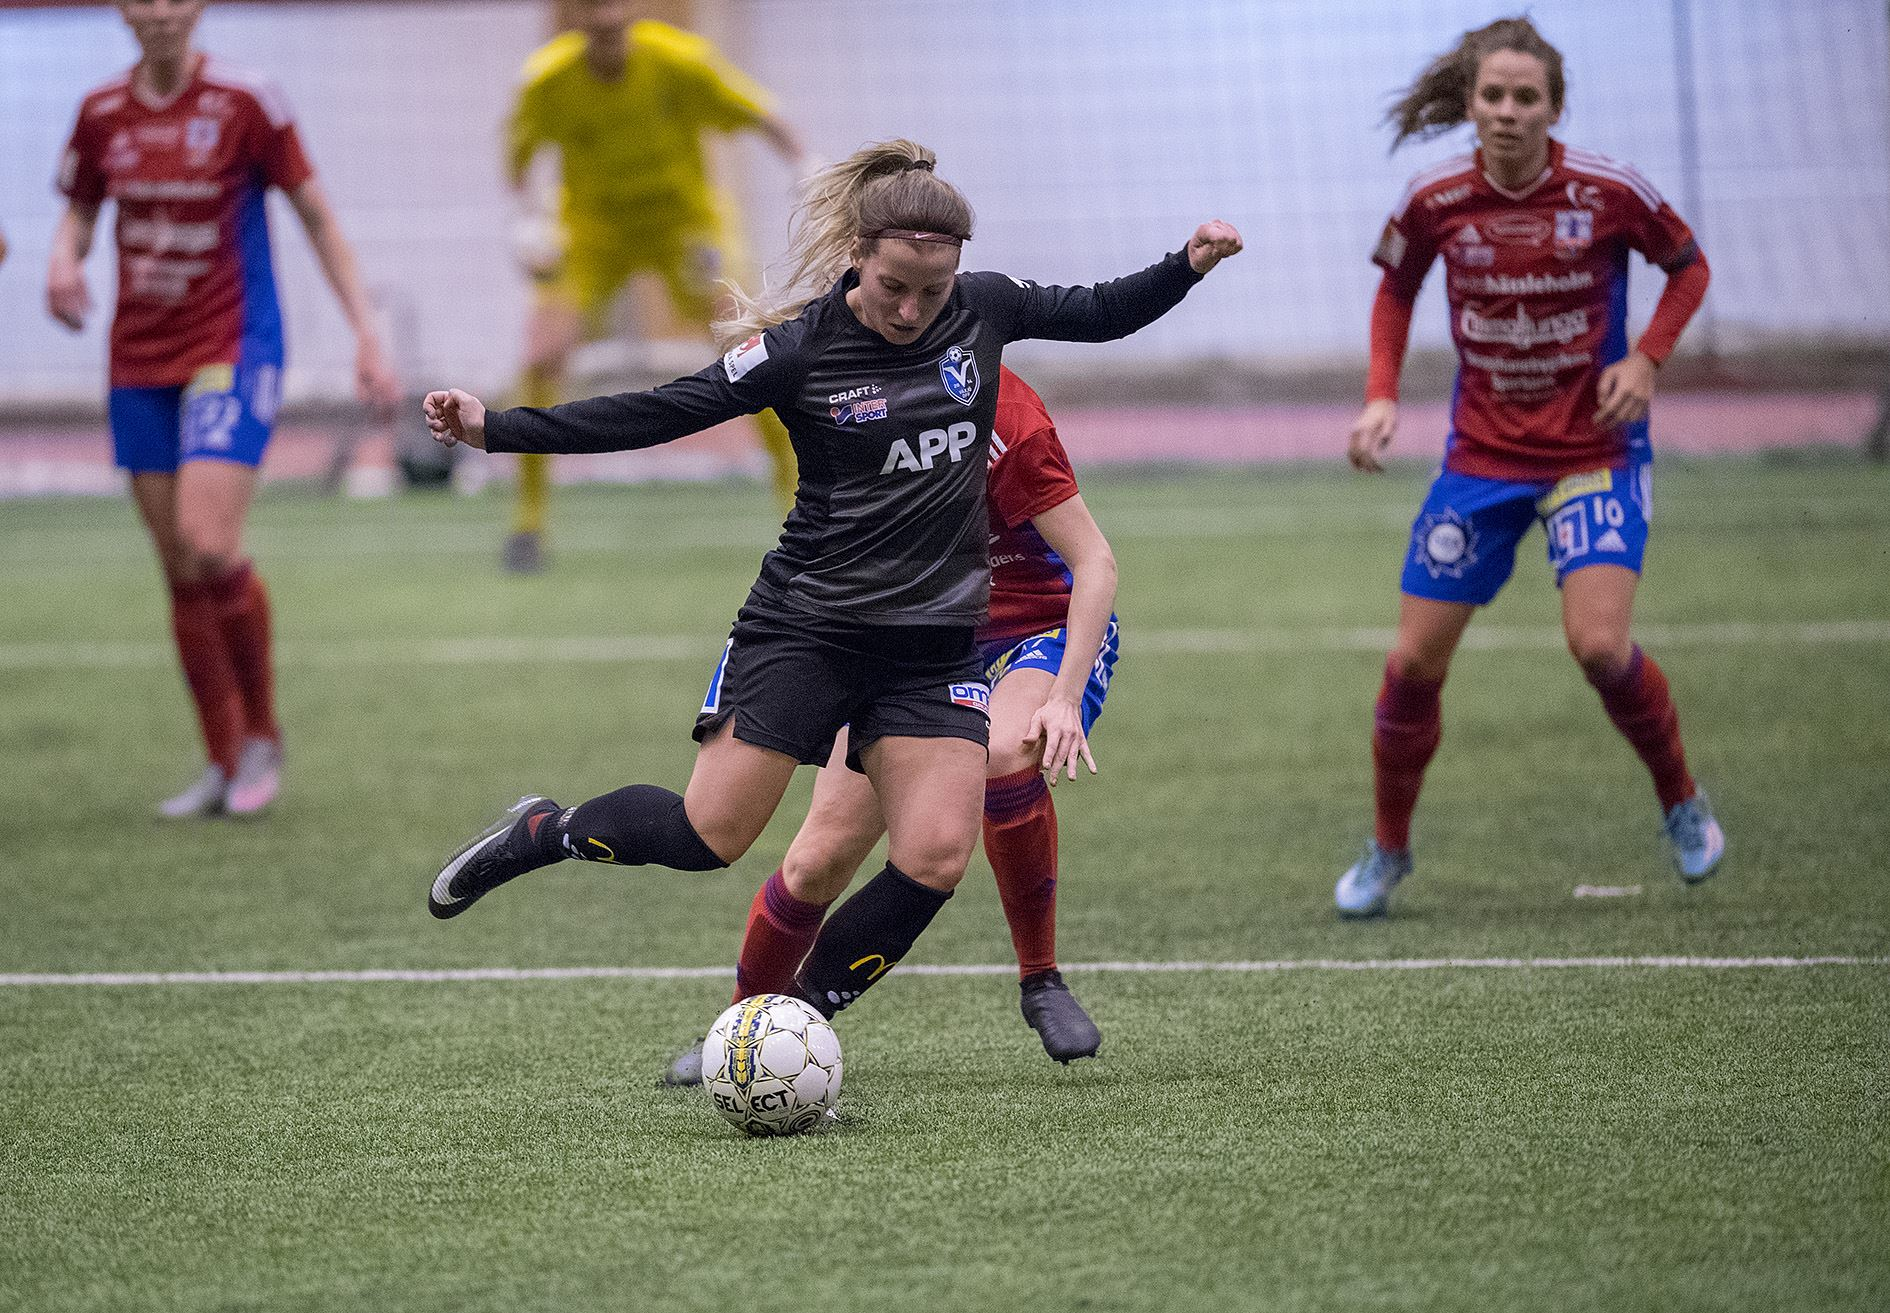 Fotboll: Växjö DFF - Djurgårdens IF FF